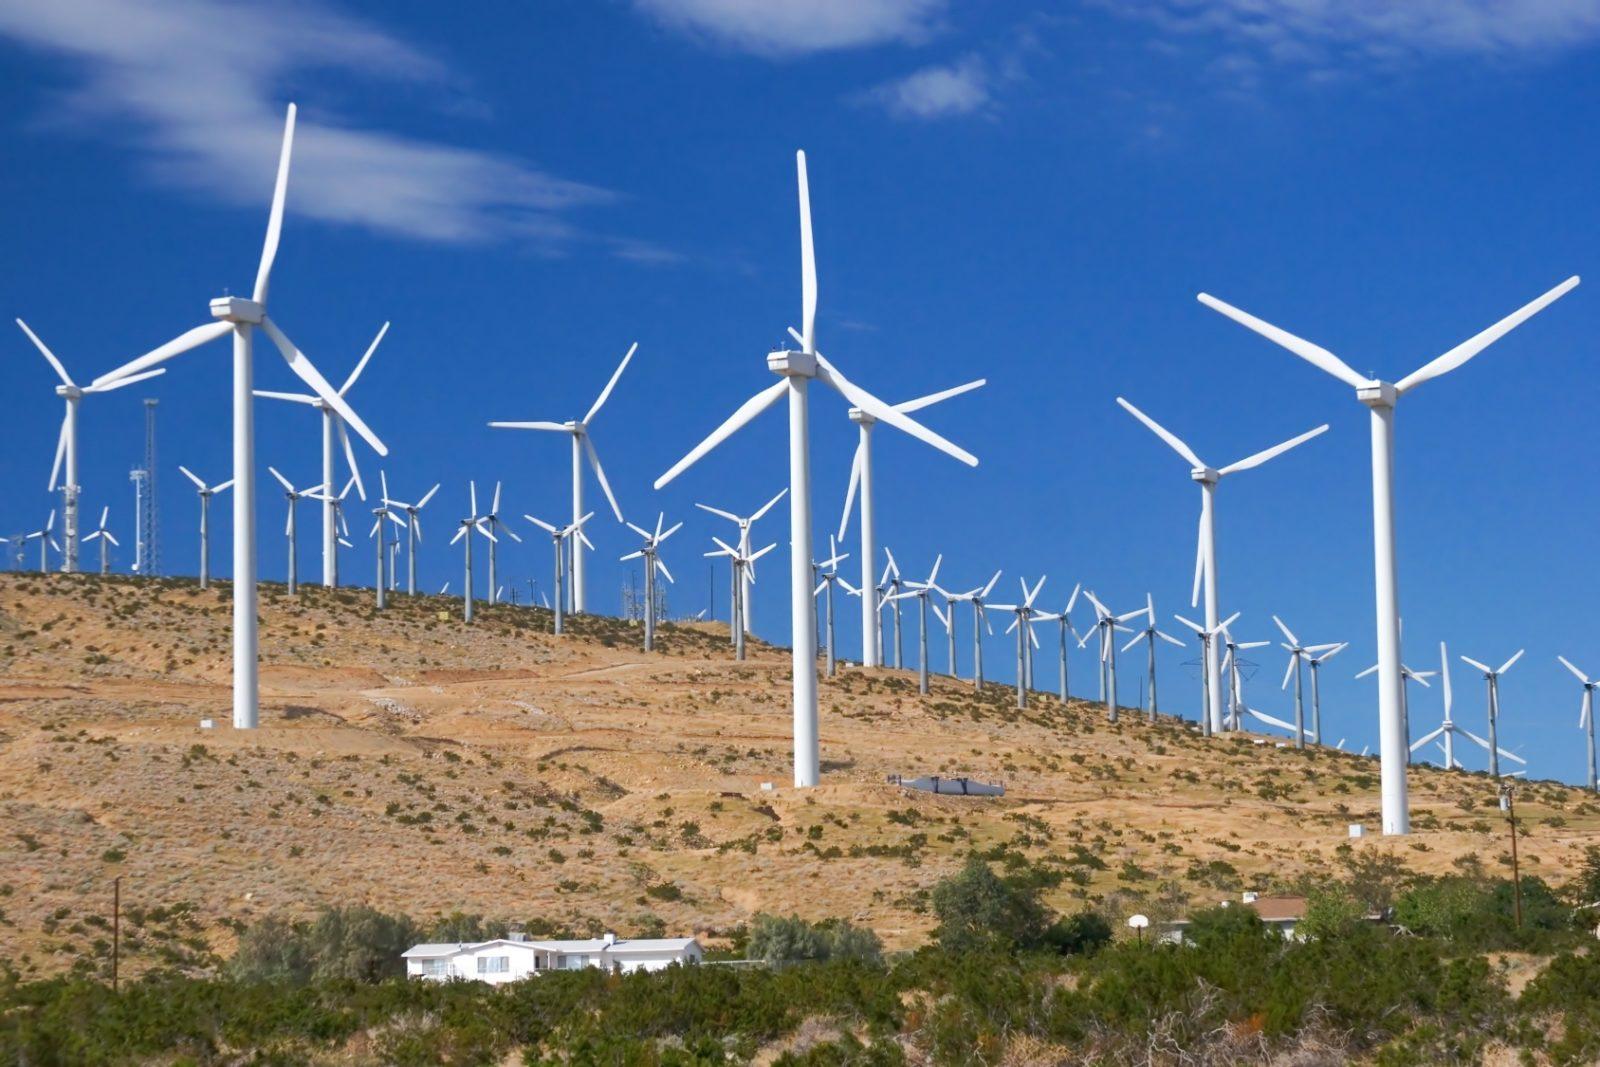 Massive Wind Farm Debuts In Panama Punta Pacifica Realty